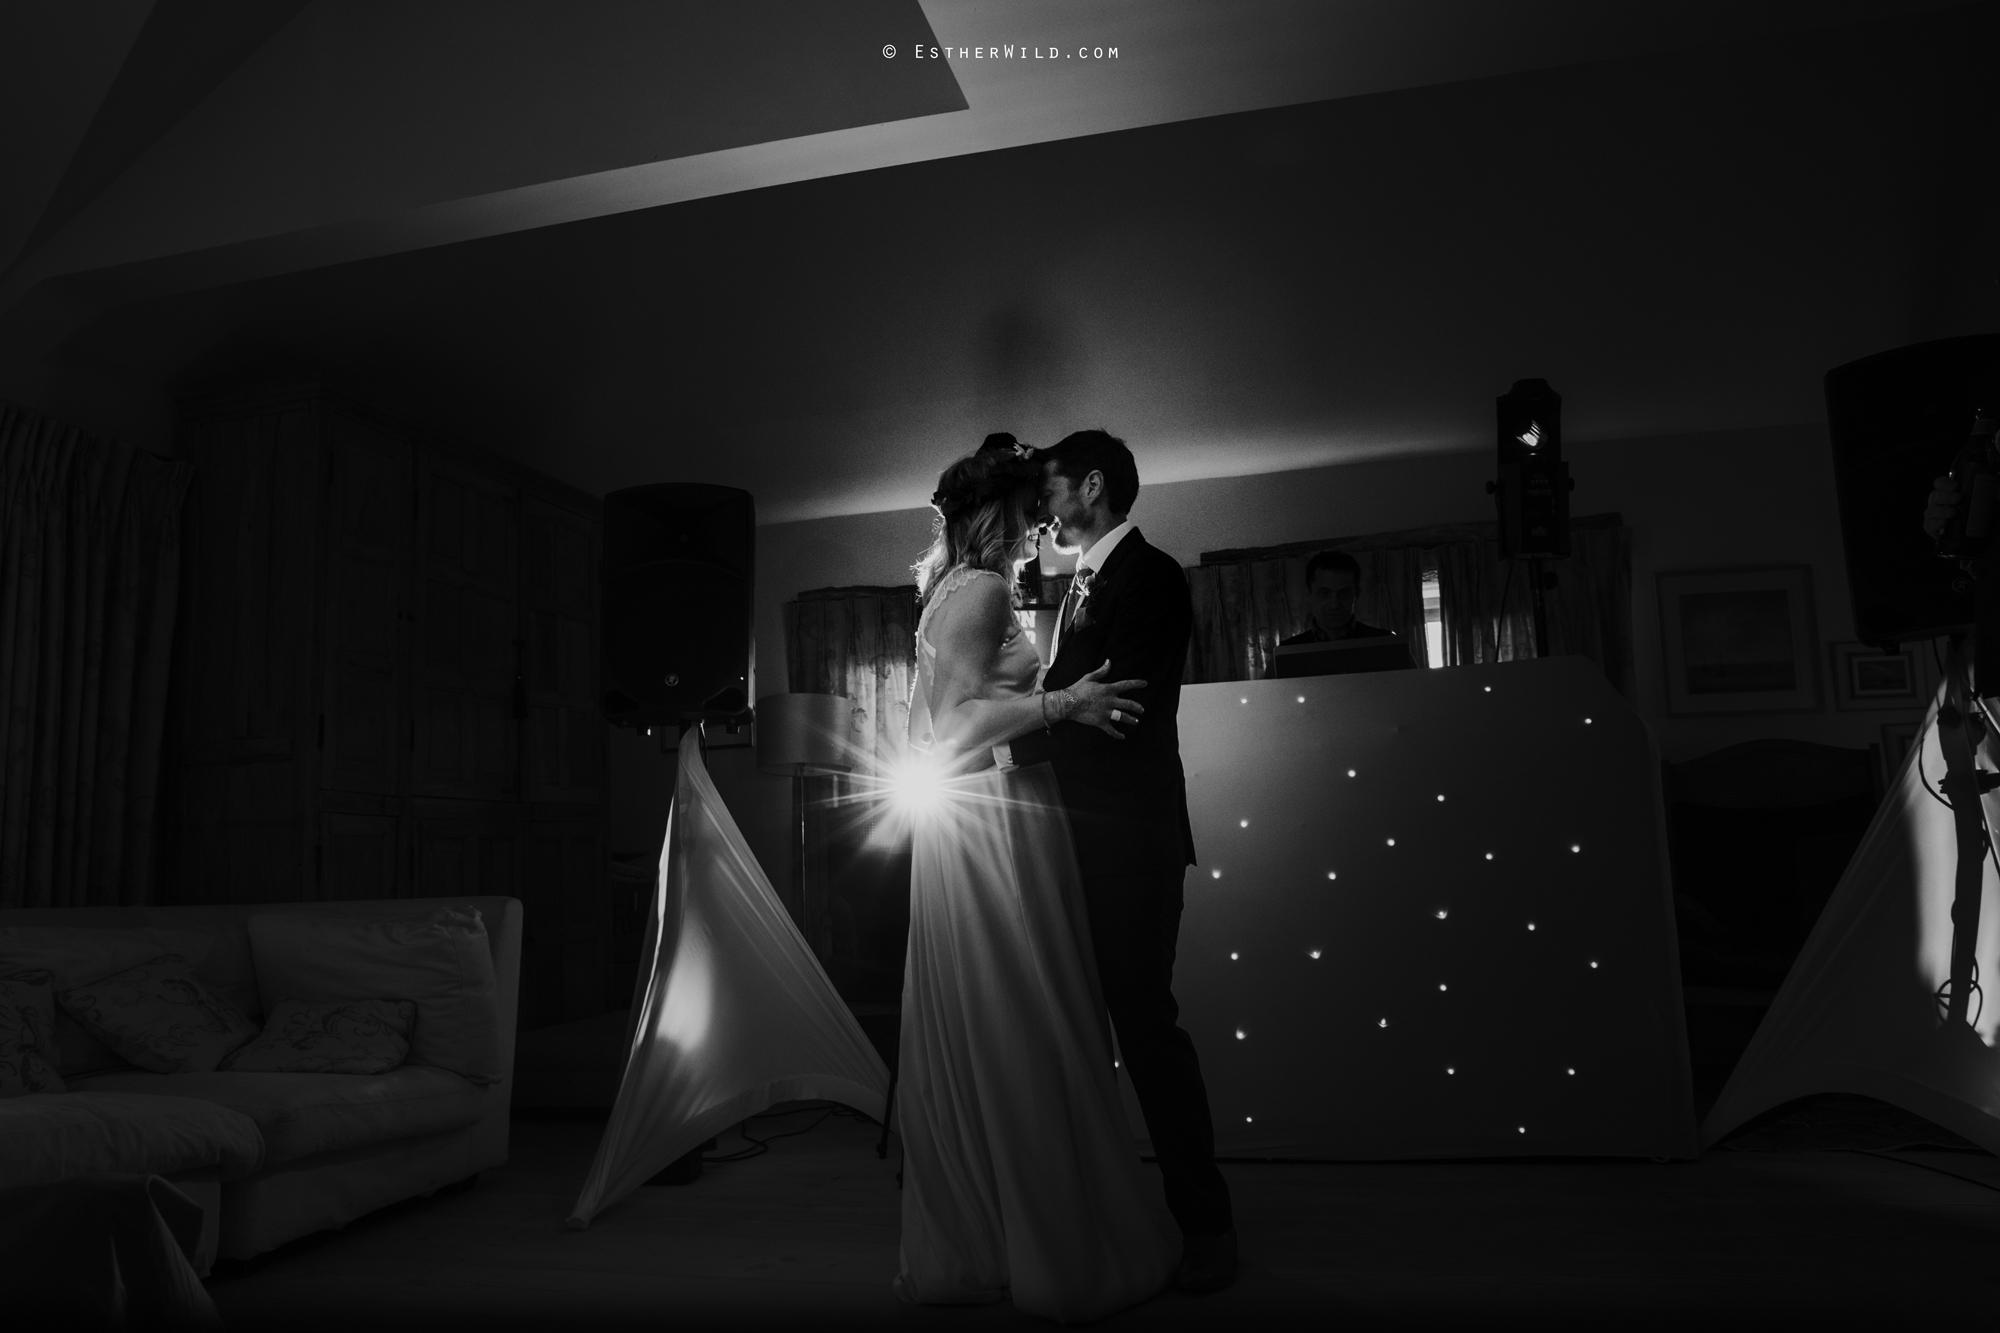 IMG_2247-2Cley_Barn_Drift_Norfolk_Coast_Wedding_Copyright_Esther_Wild_Photographer_.jpg